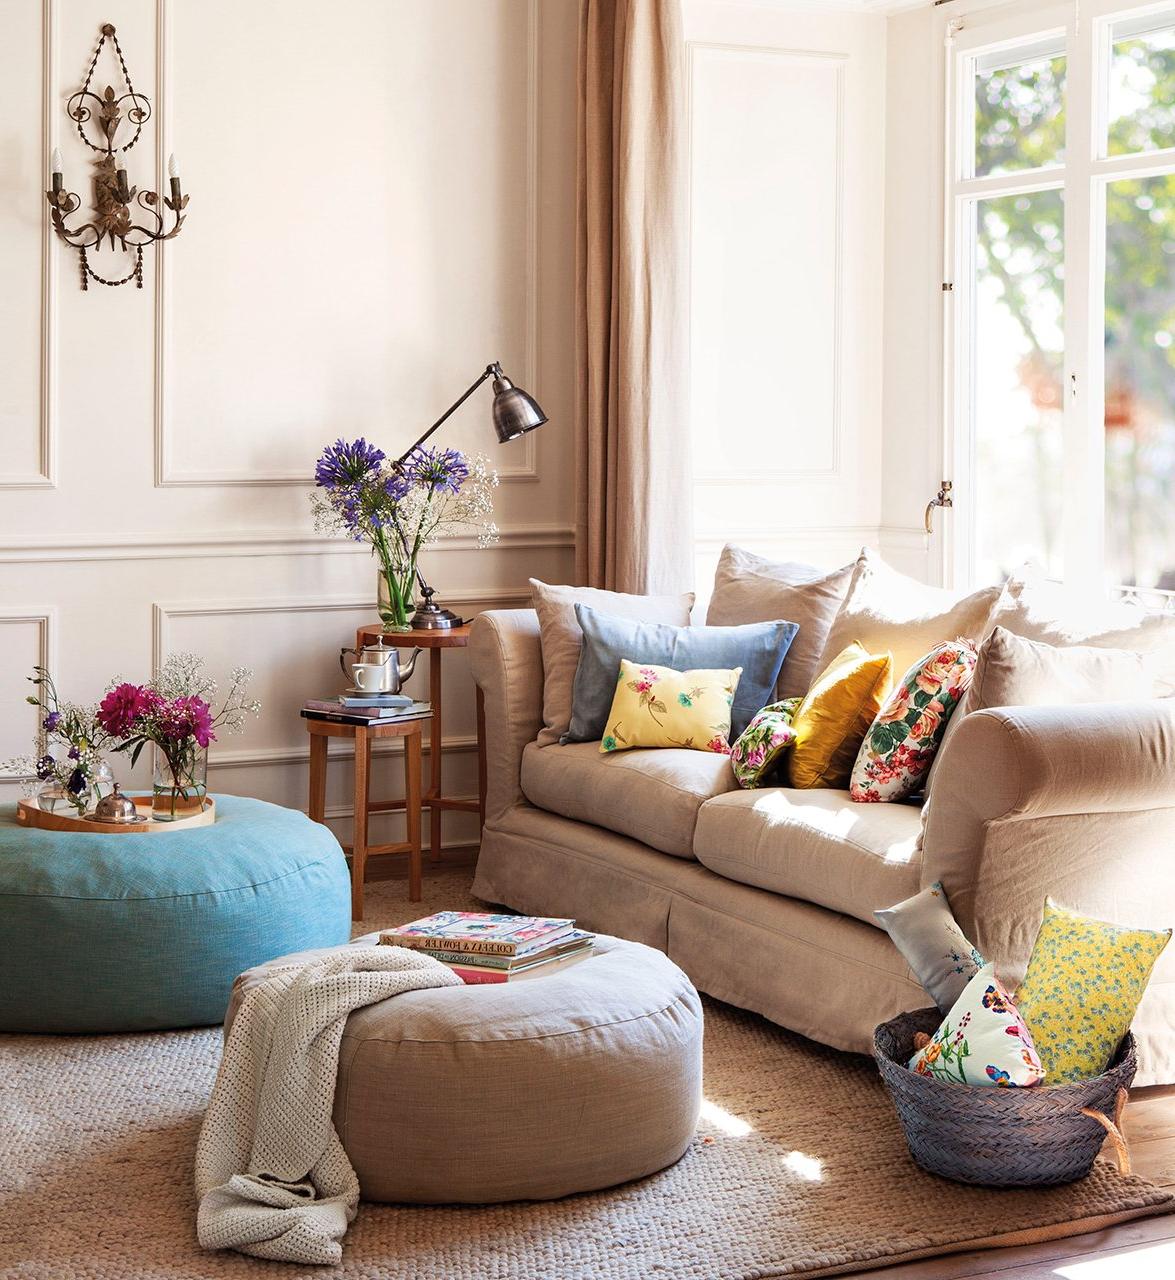 Muebles Para Salones Pequeños Rldj Muebles Para Casas Pequeà as Puff Para Salones Pequeà Os